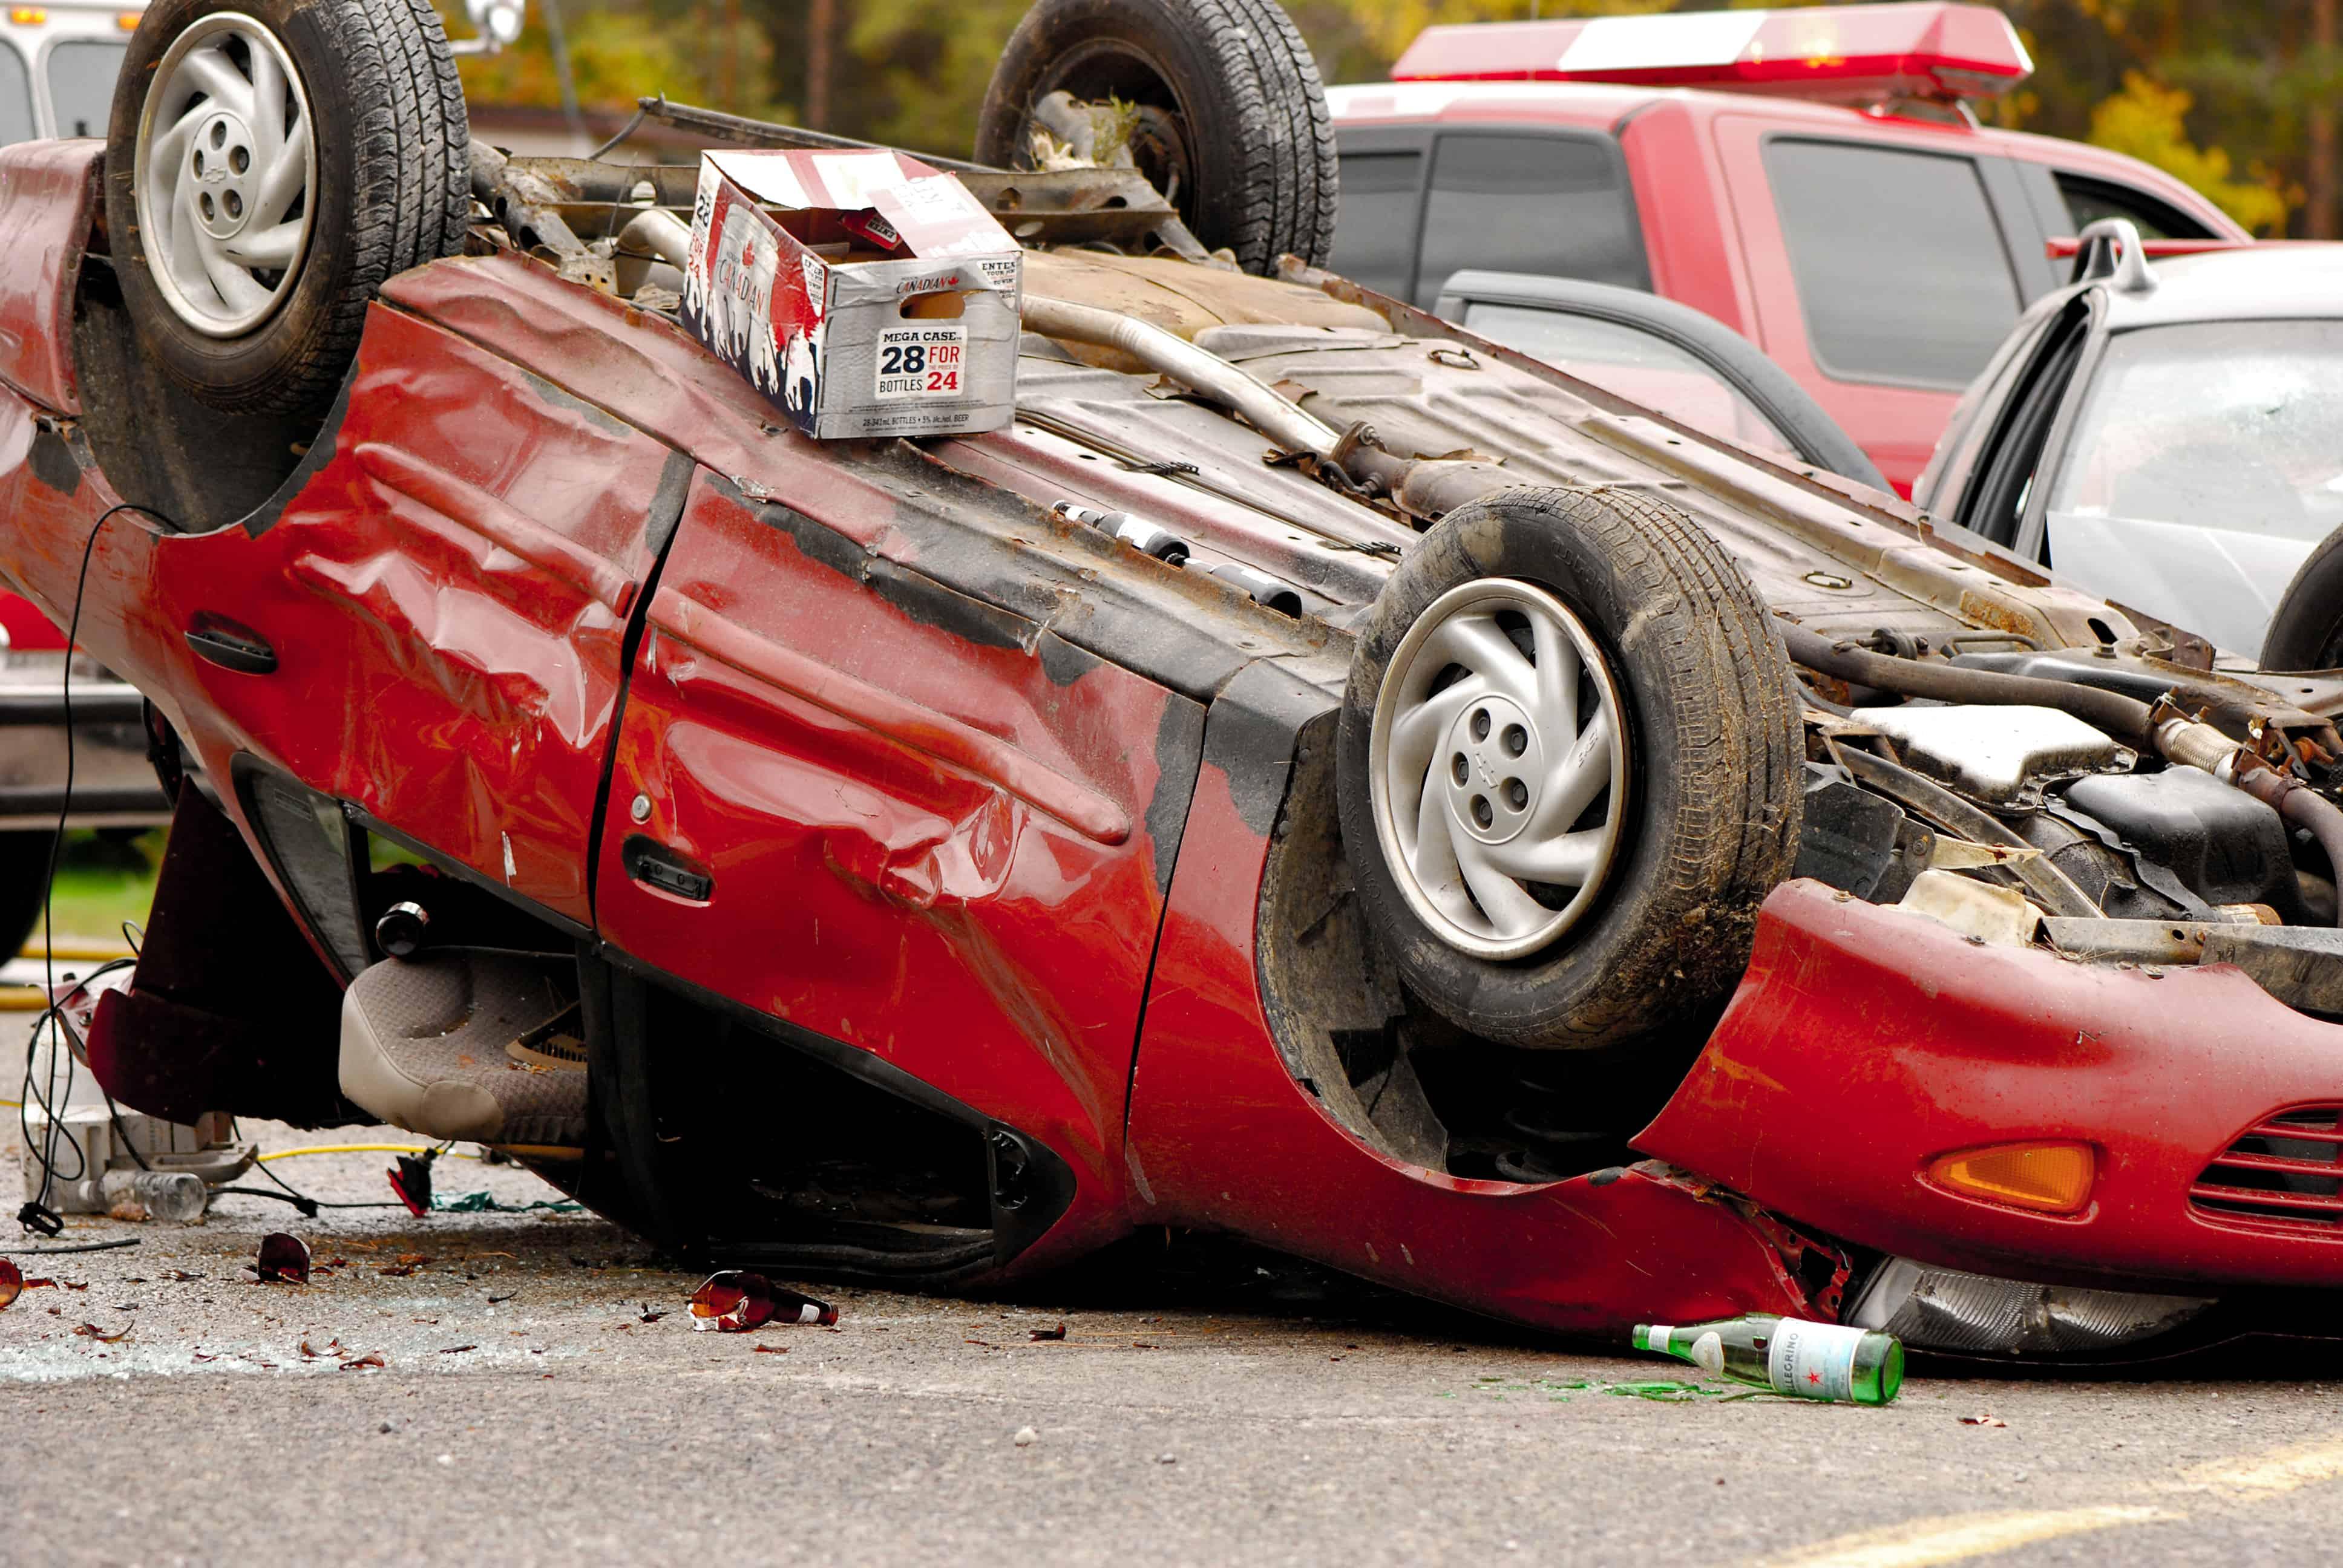 Speeding Woman Dies after Multi-Vehicle Crash on US 50 [South Lake Tahoe, CA]